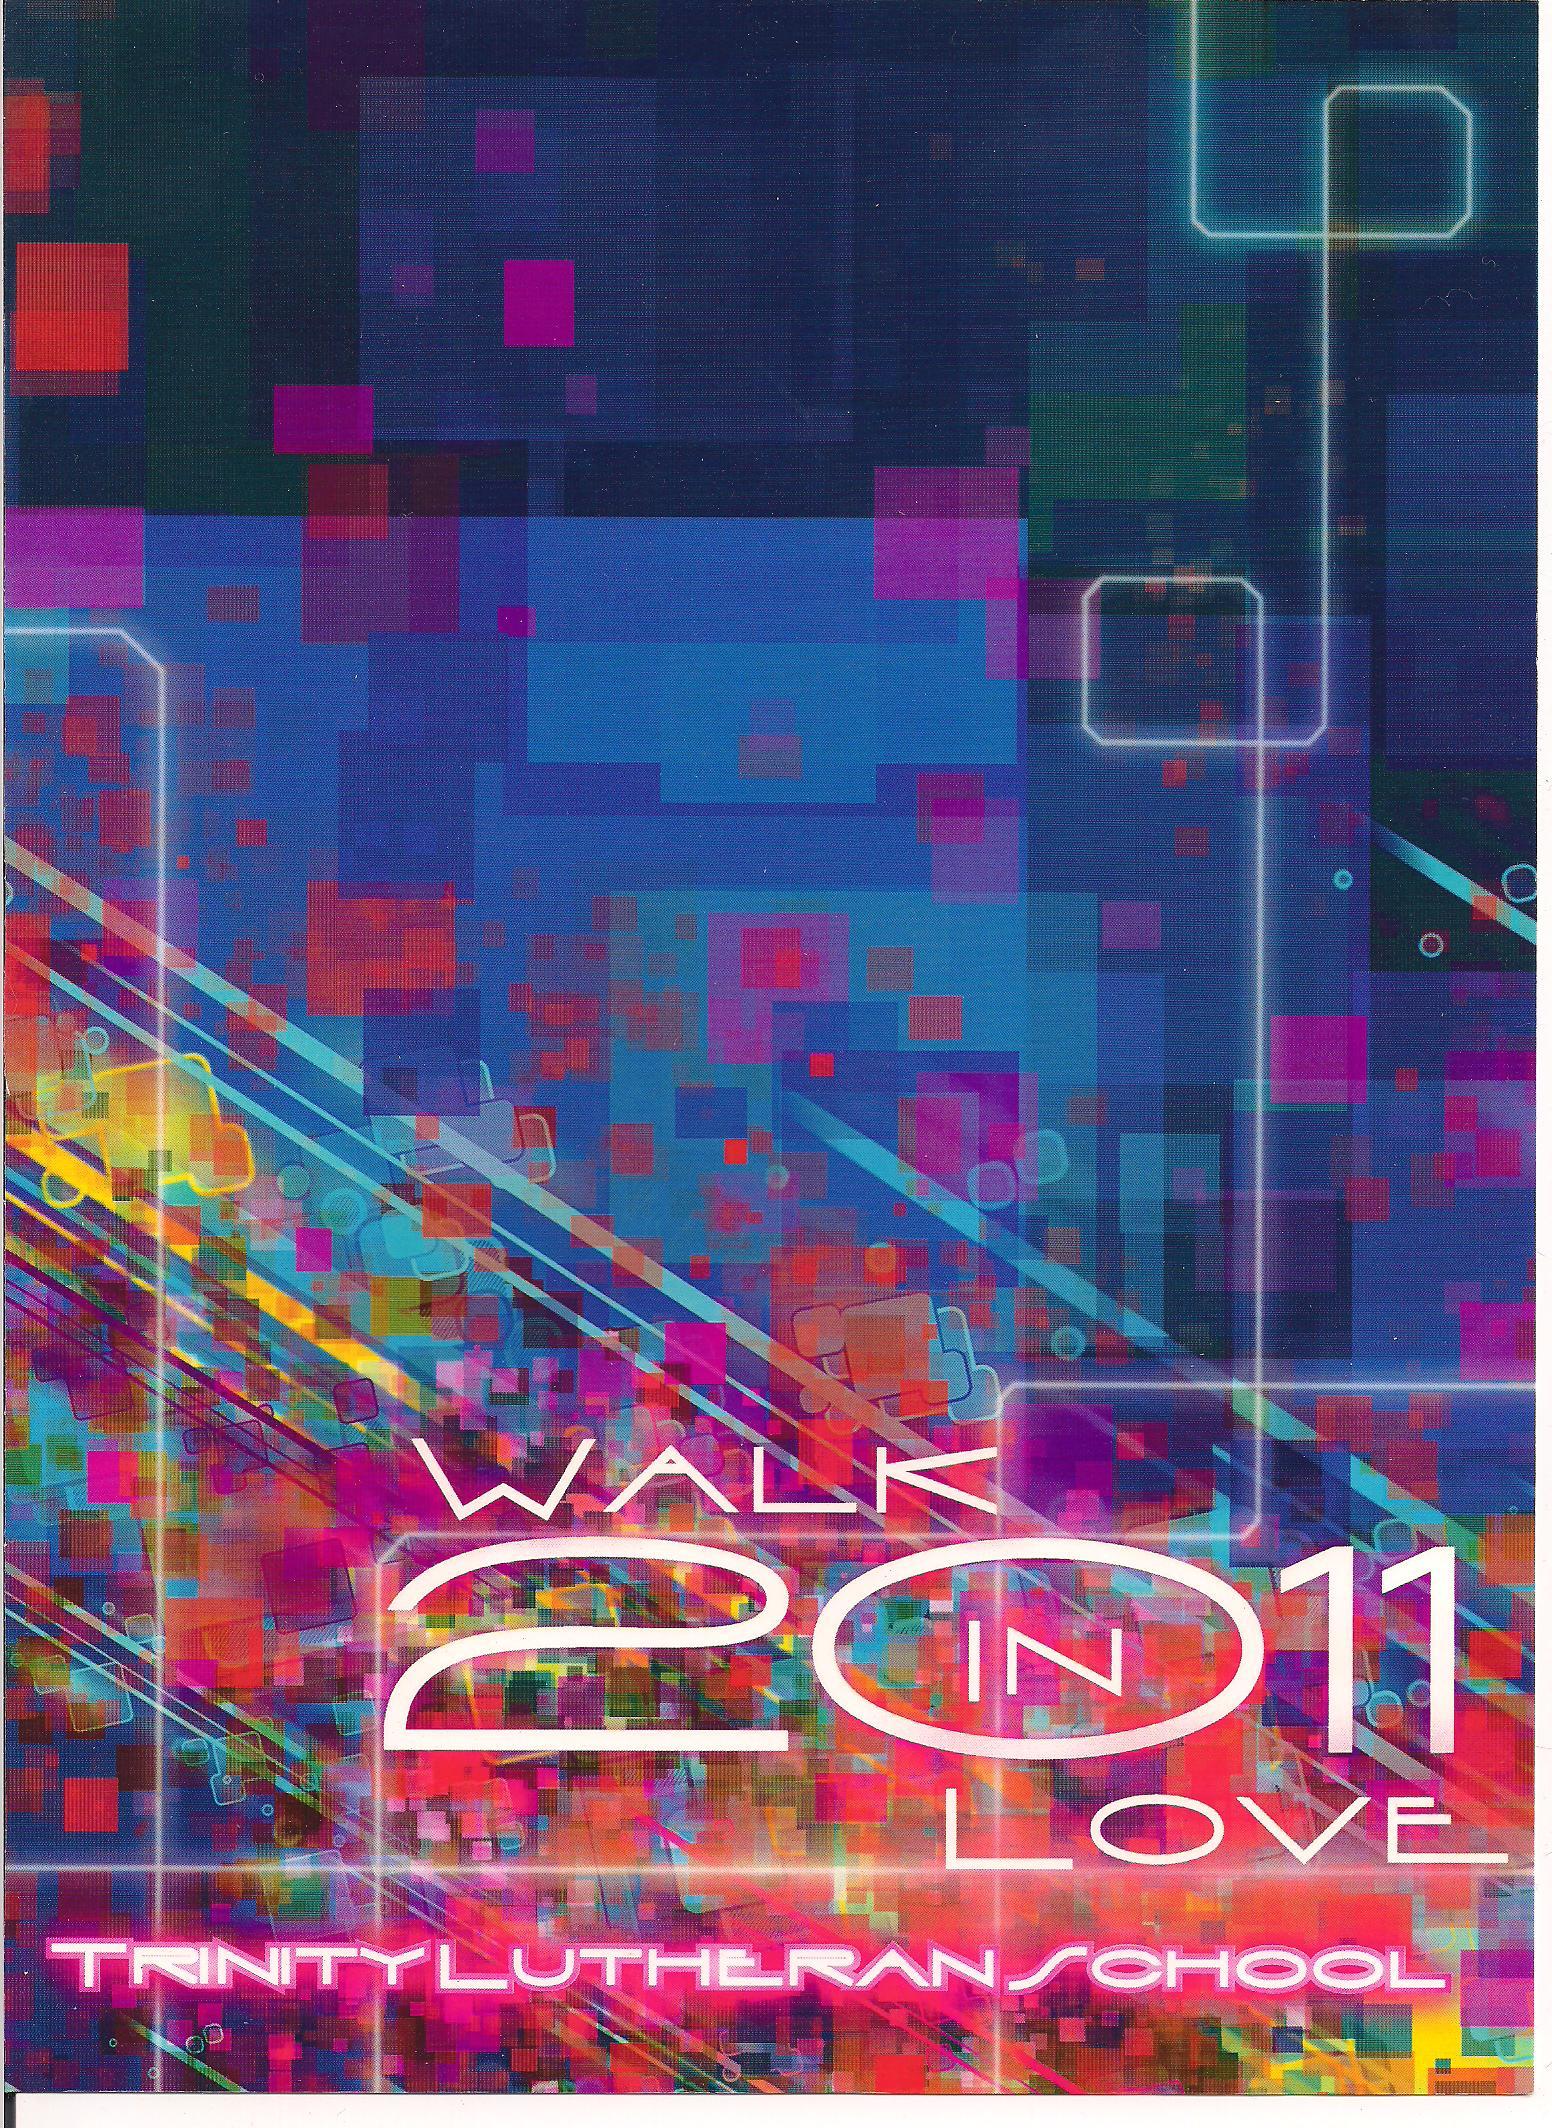 2010 - 2011 FtCvr